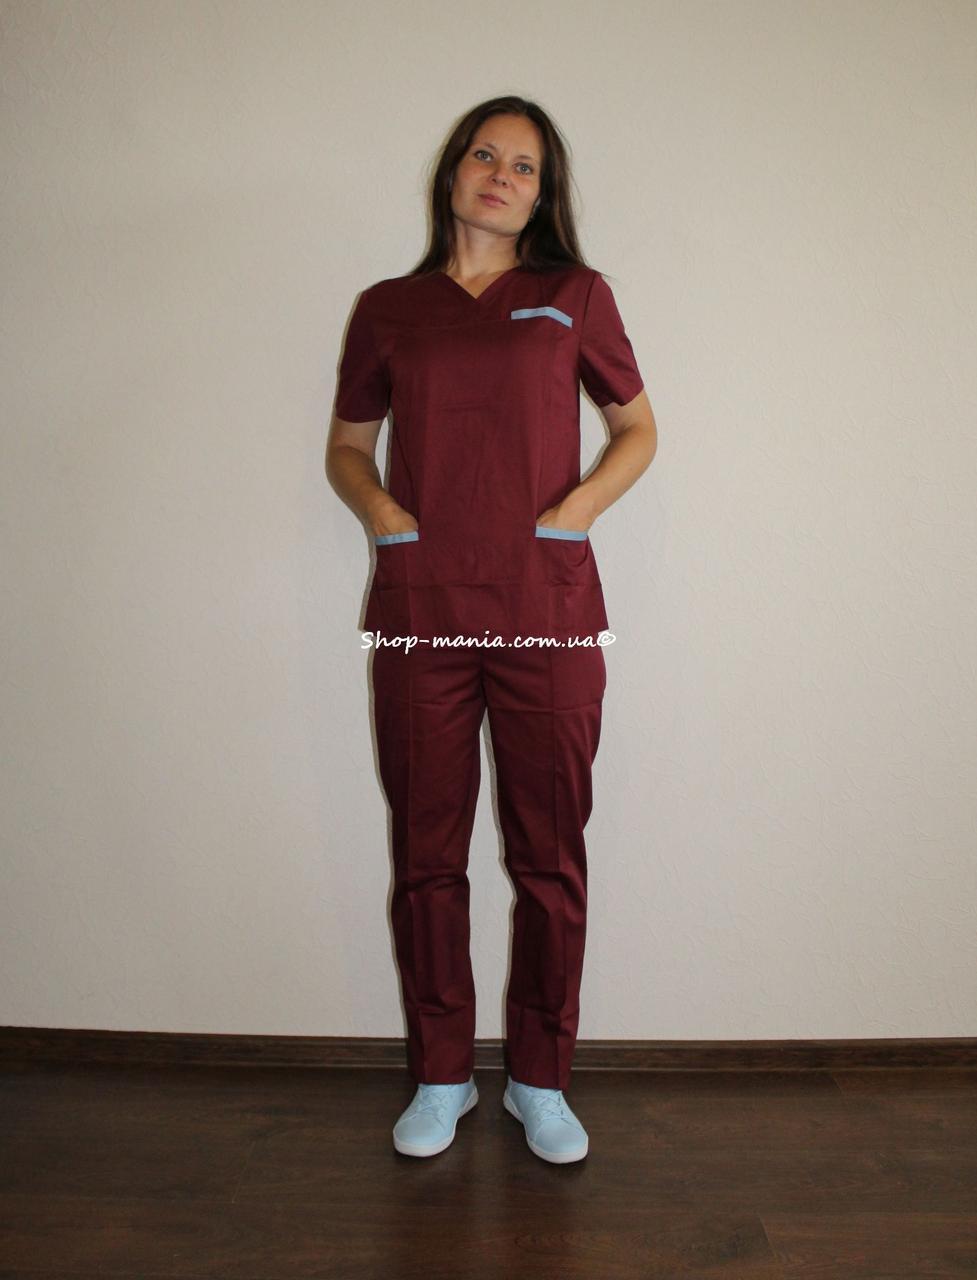 Хирургический медицинский женский костюм SM 1400-7 коттон Lilija 42-56 р (бордо-серый-бордо)